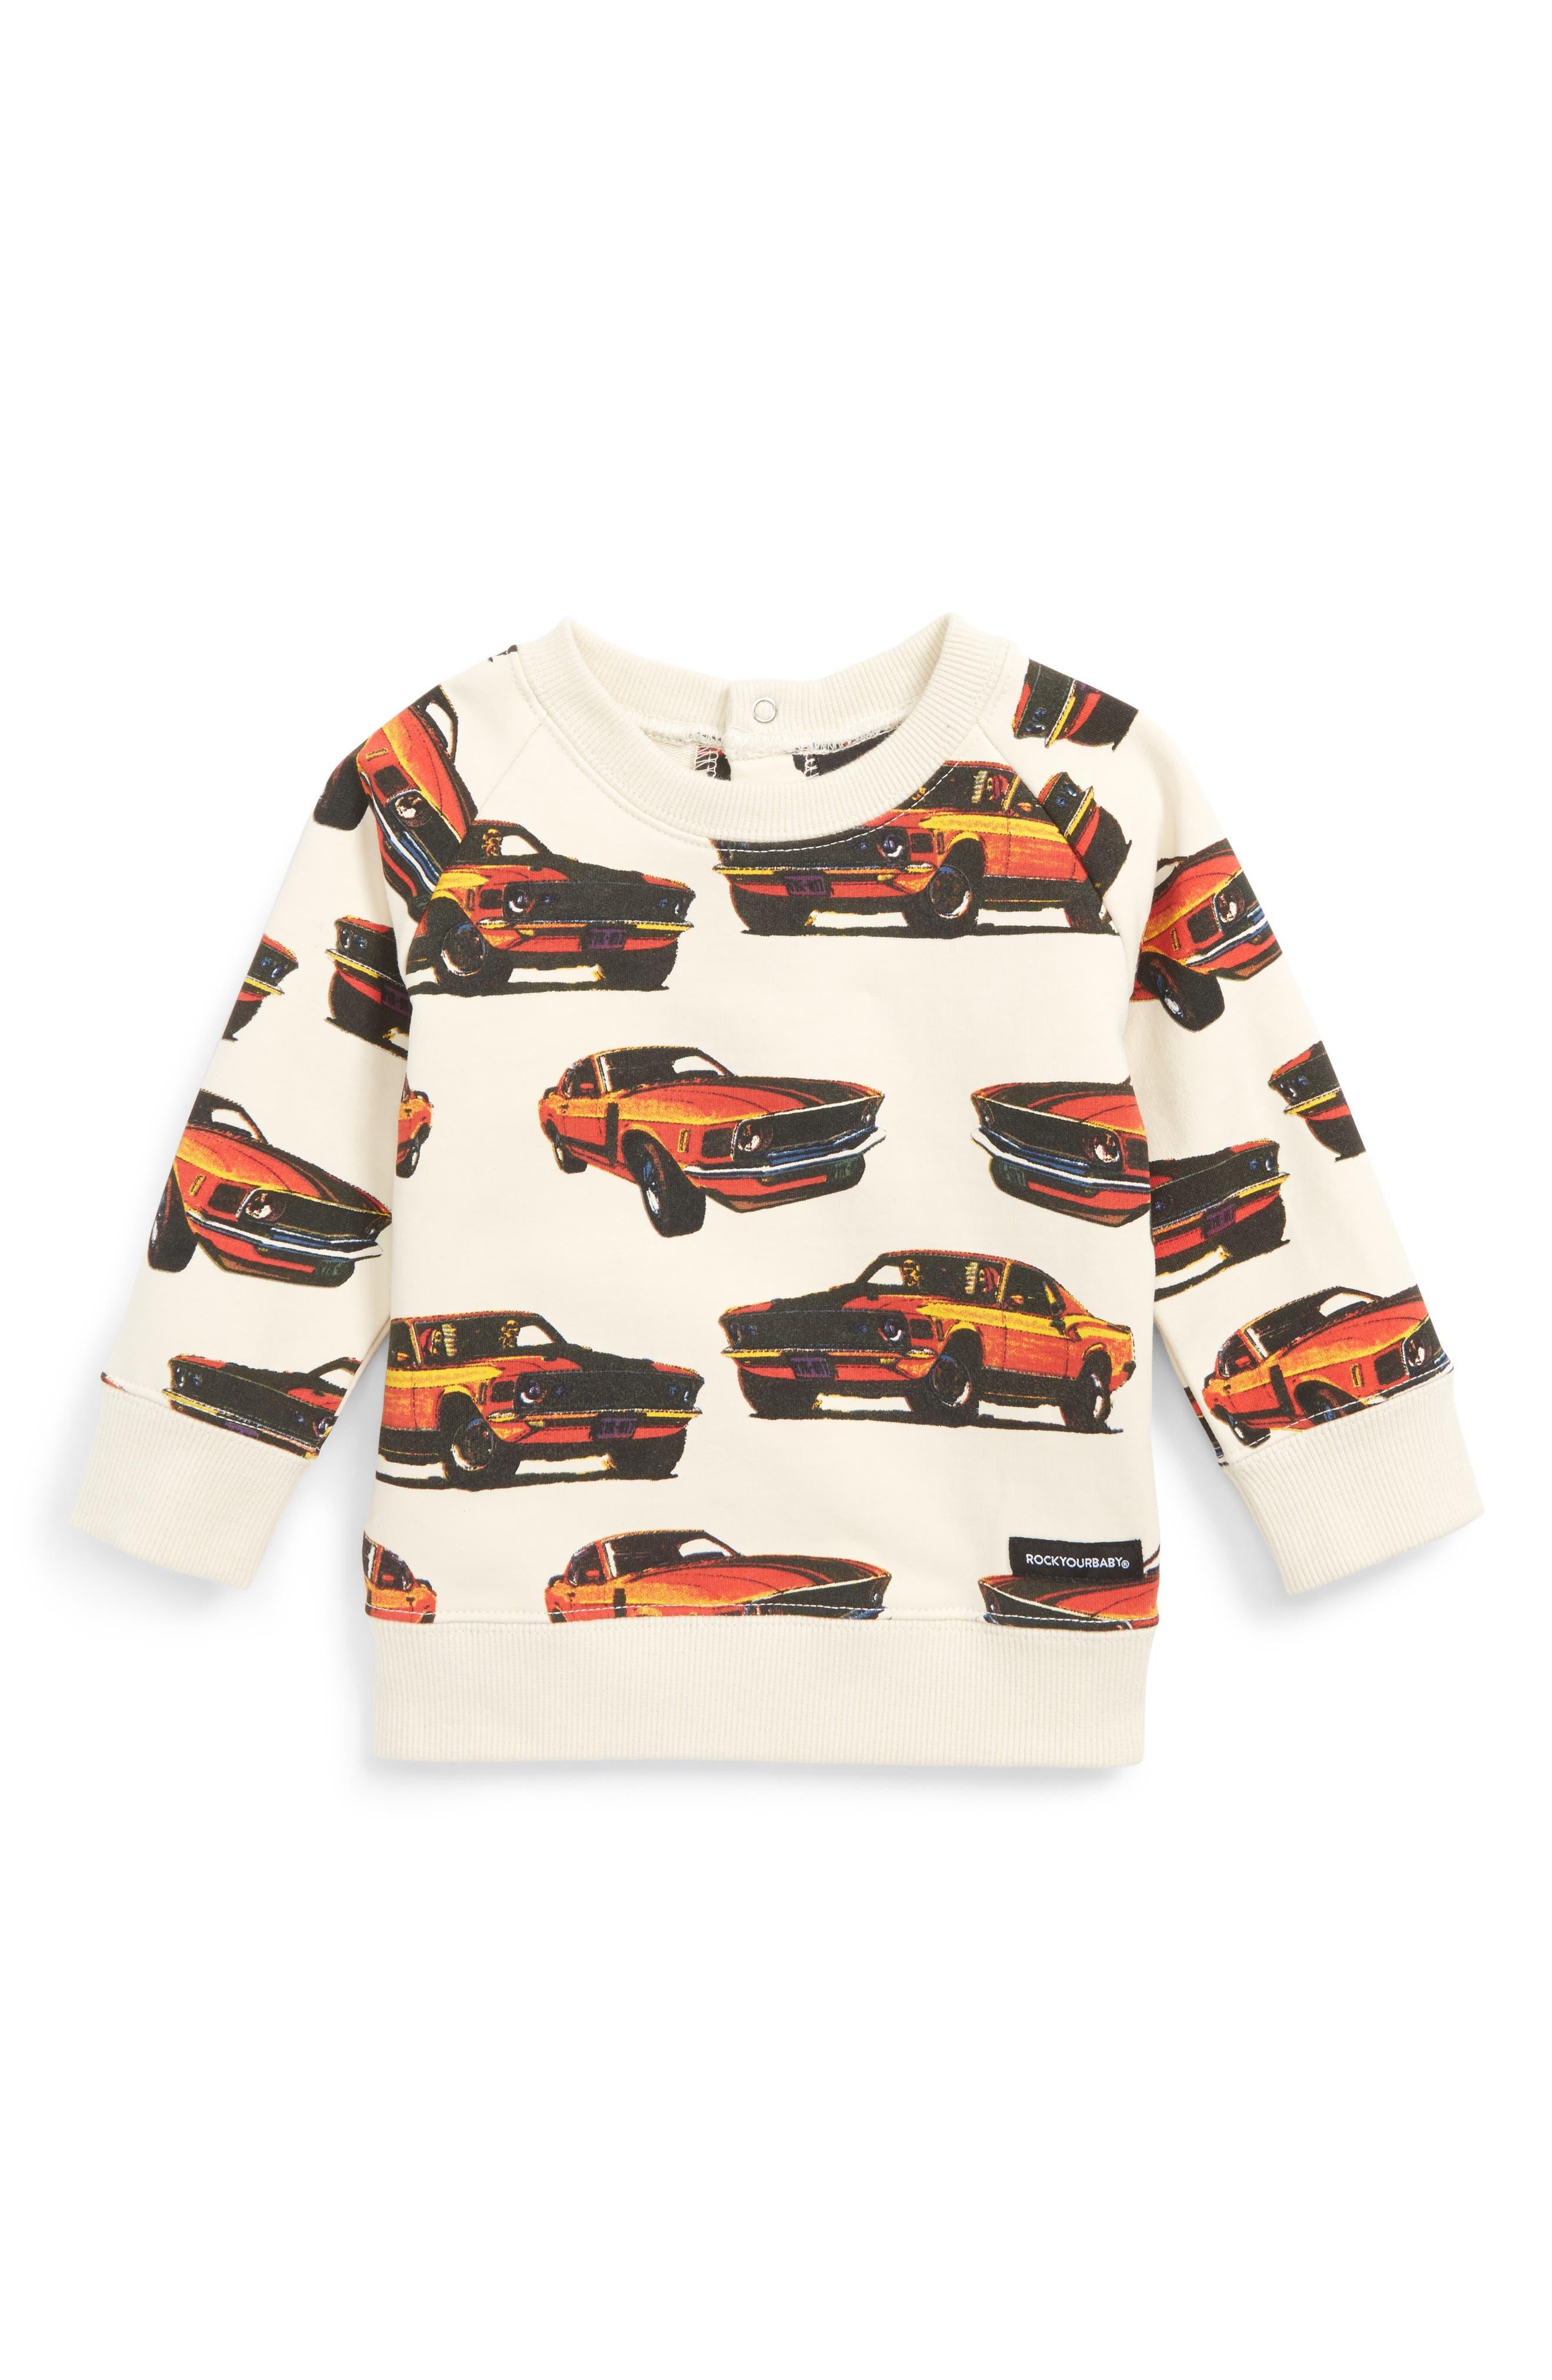 Eat My Dust Sweatshirt,                         Main,                         color, 900